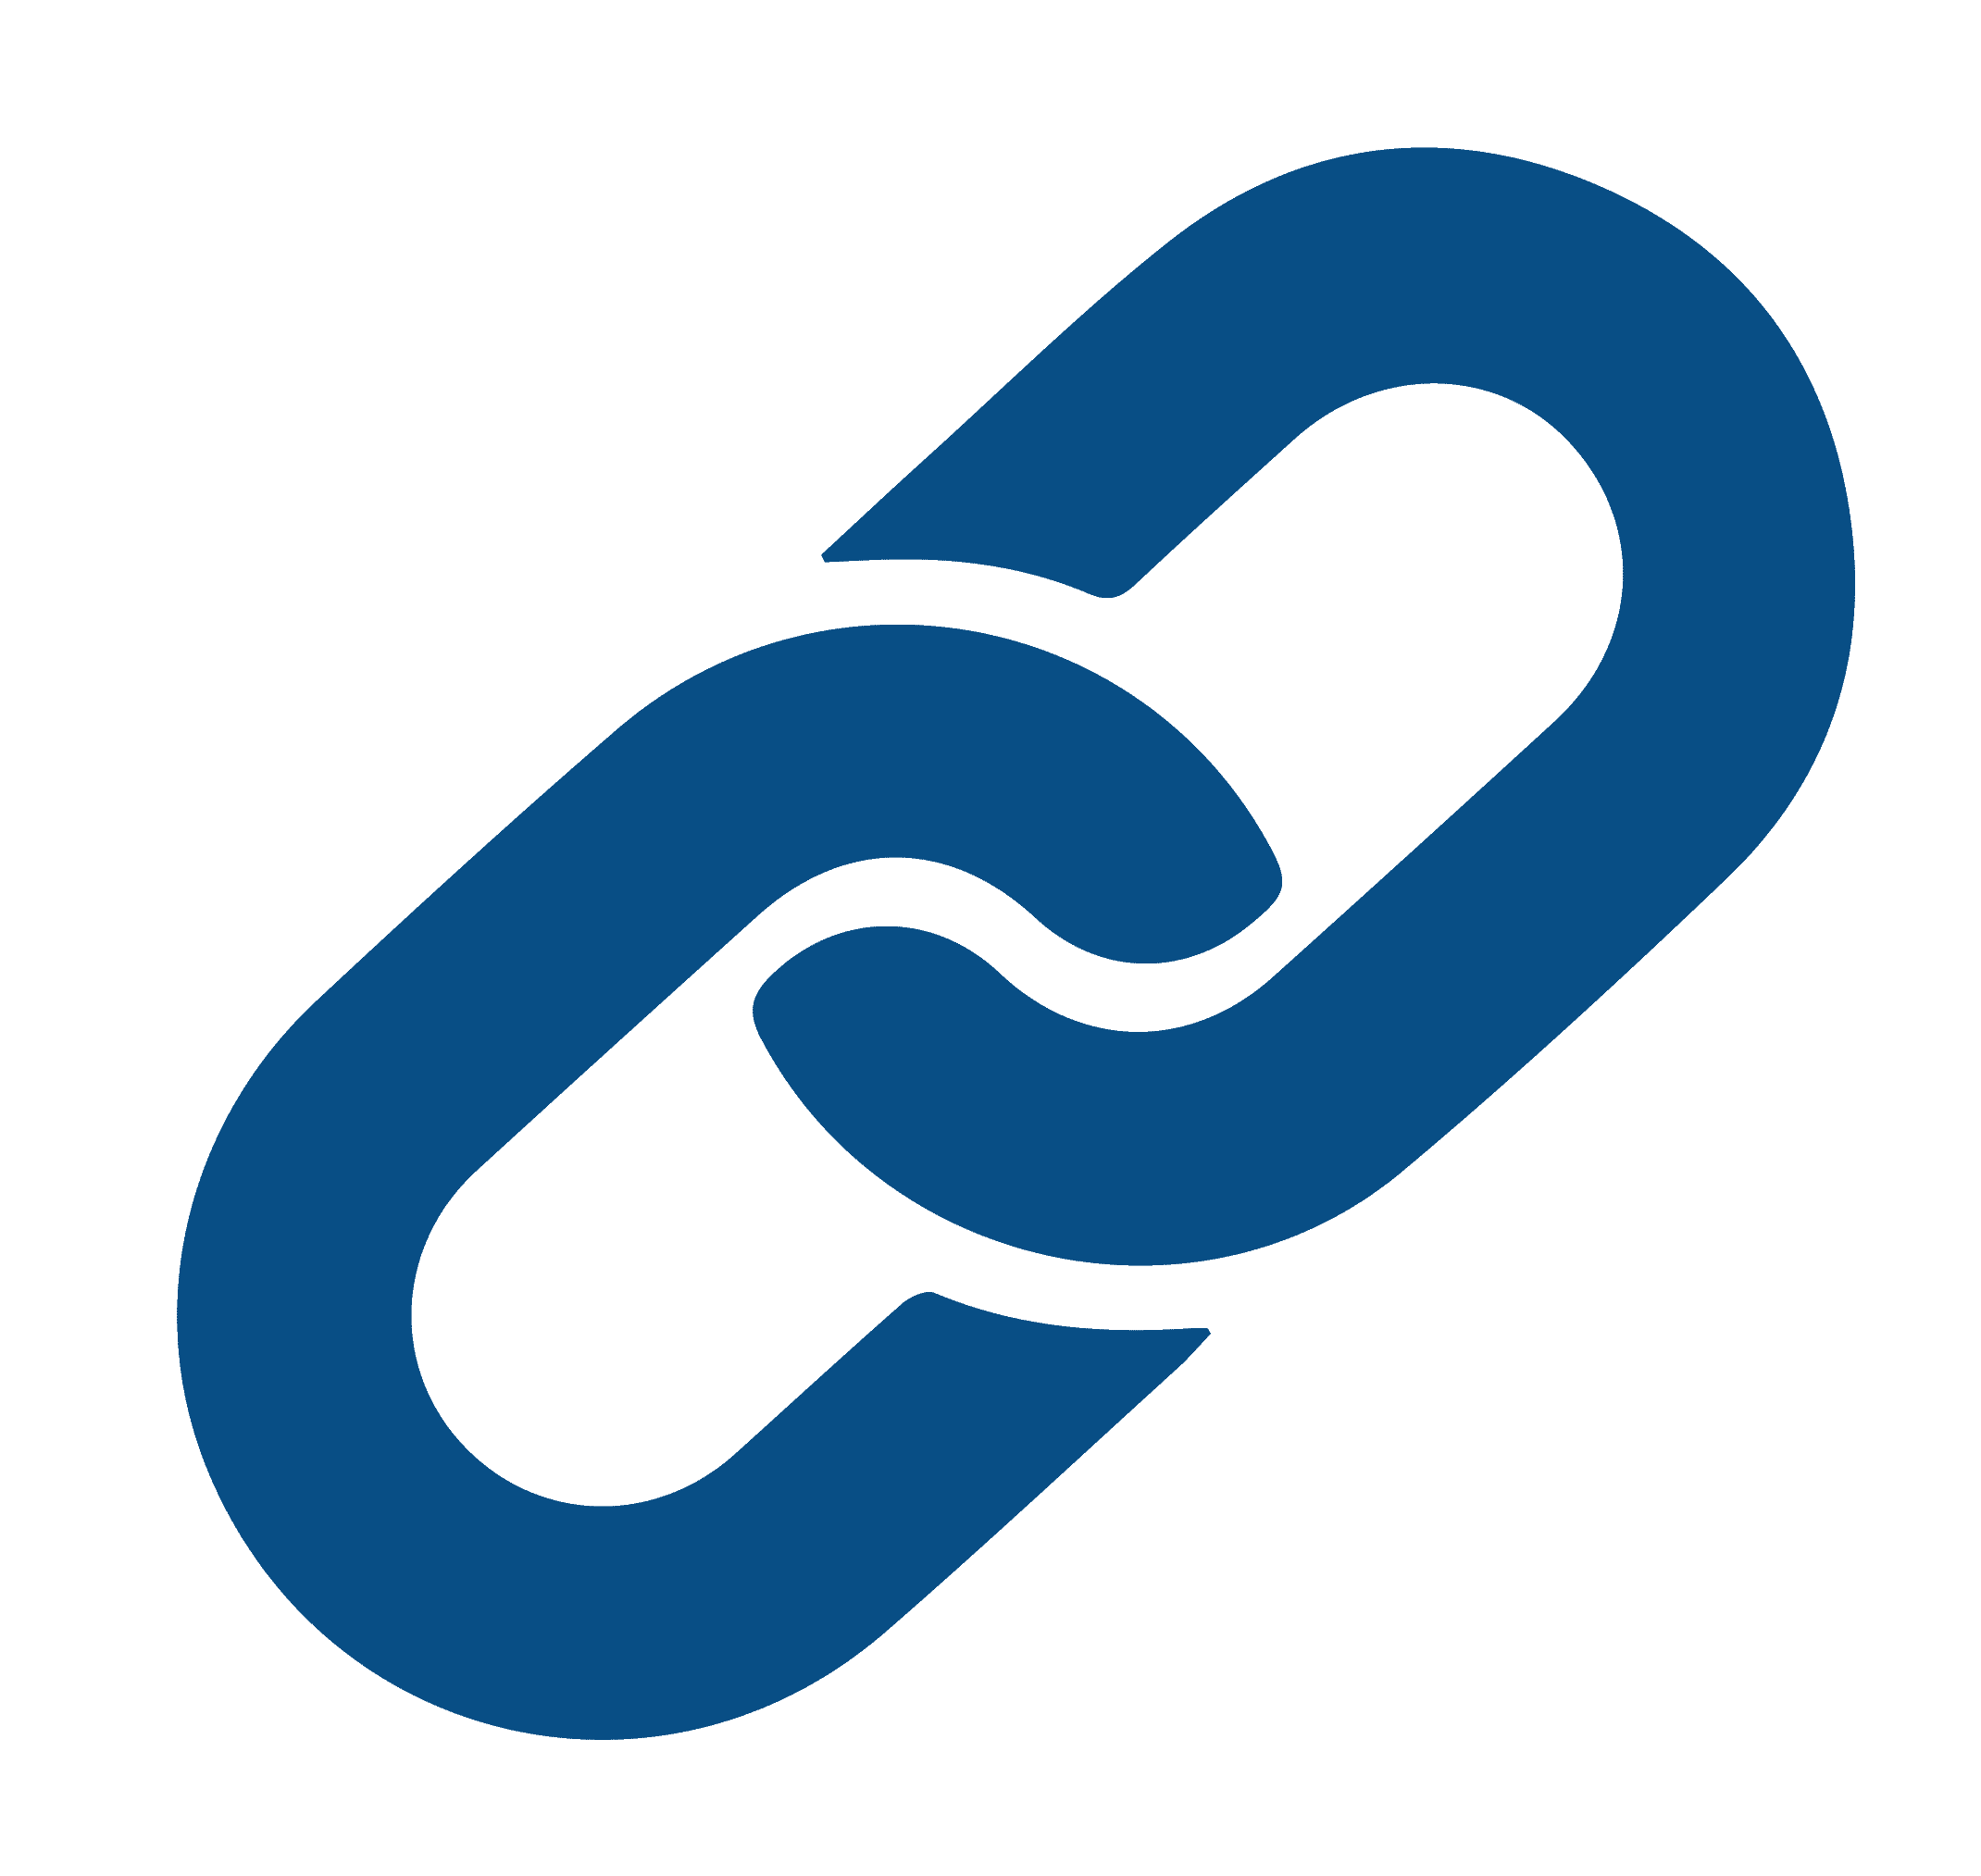 Icon ข้อดีรั้วตาข่ายฟิคซ์ล็อค ผลิตจากลวดแรงดึงสูง